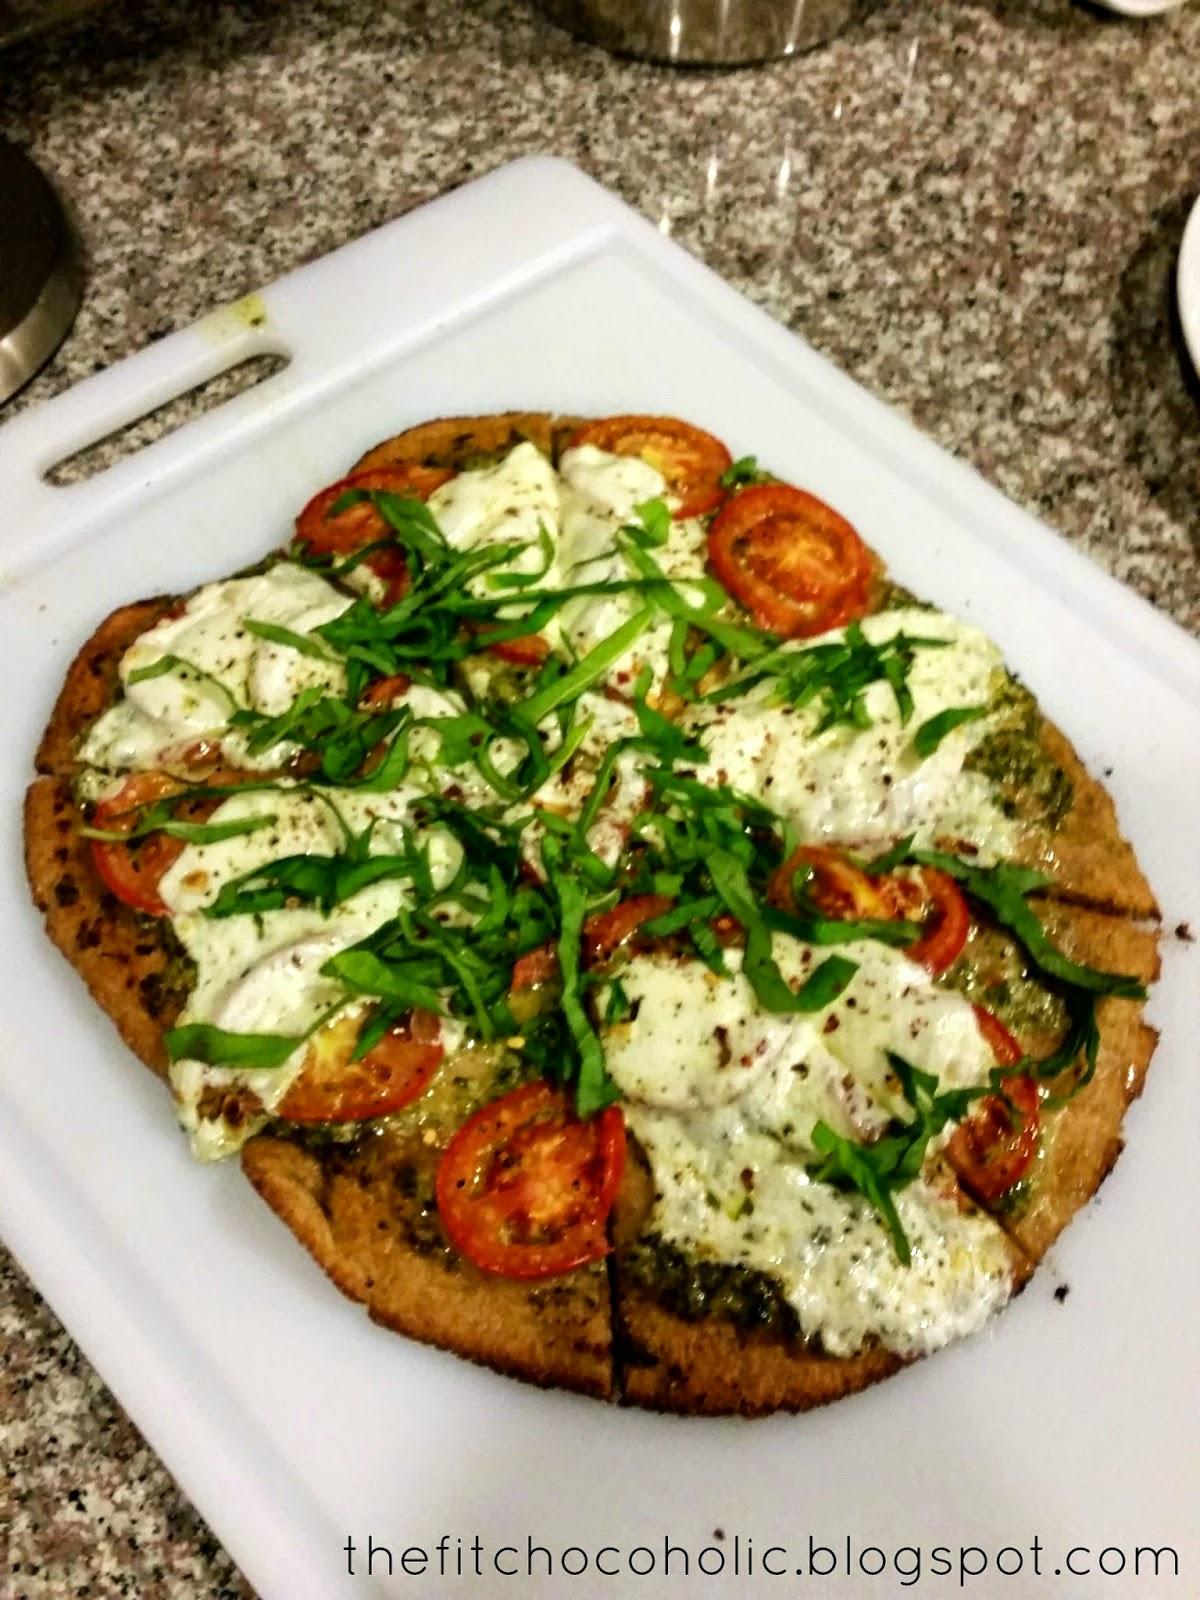 The Fit Chocoholic: Whole Wheat Basil Pesto and Roma Tomato Pizza